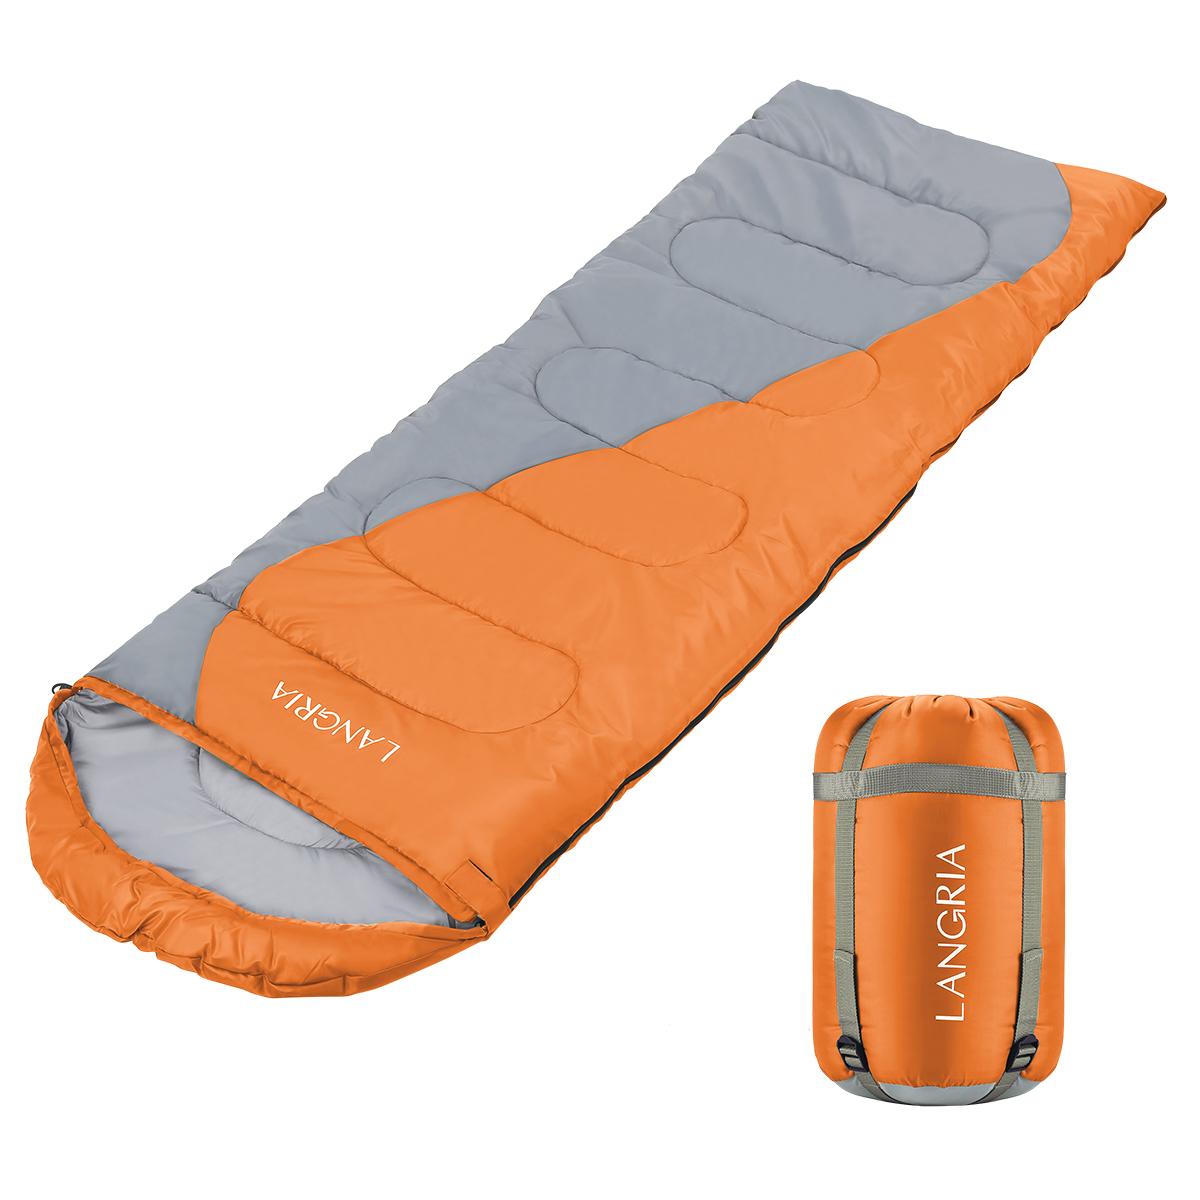 Slumbersac Standard Toddler Sleeping Bag with Feet 2.5 Tog Shaun The Sheep 24-36 Months/ 100 cm Sleeping Bags Baby Boys 0-24m